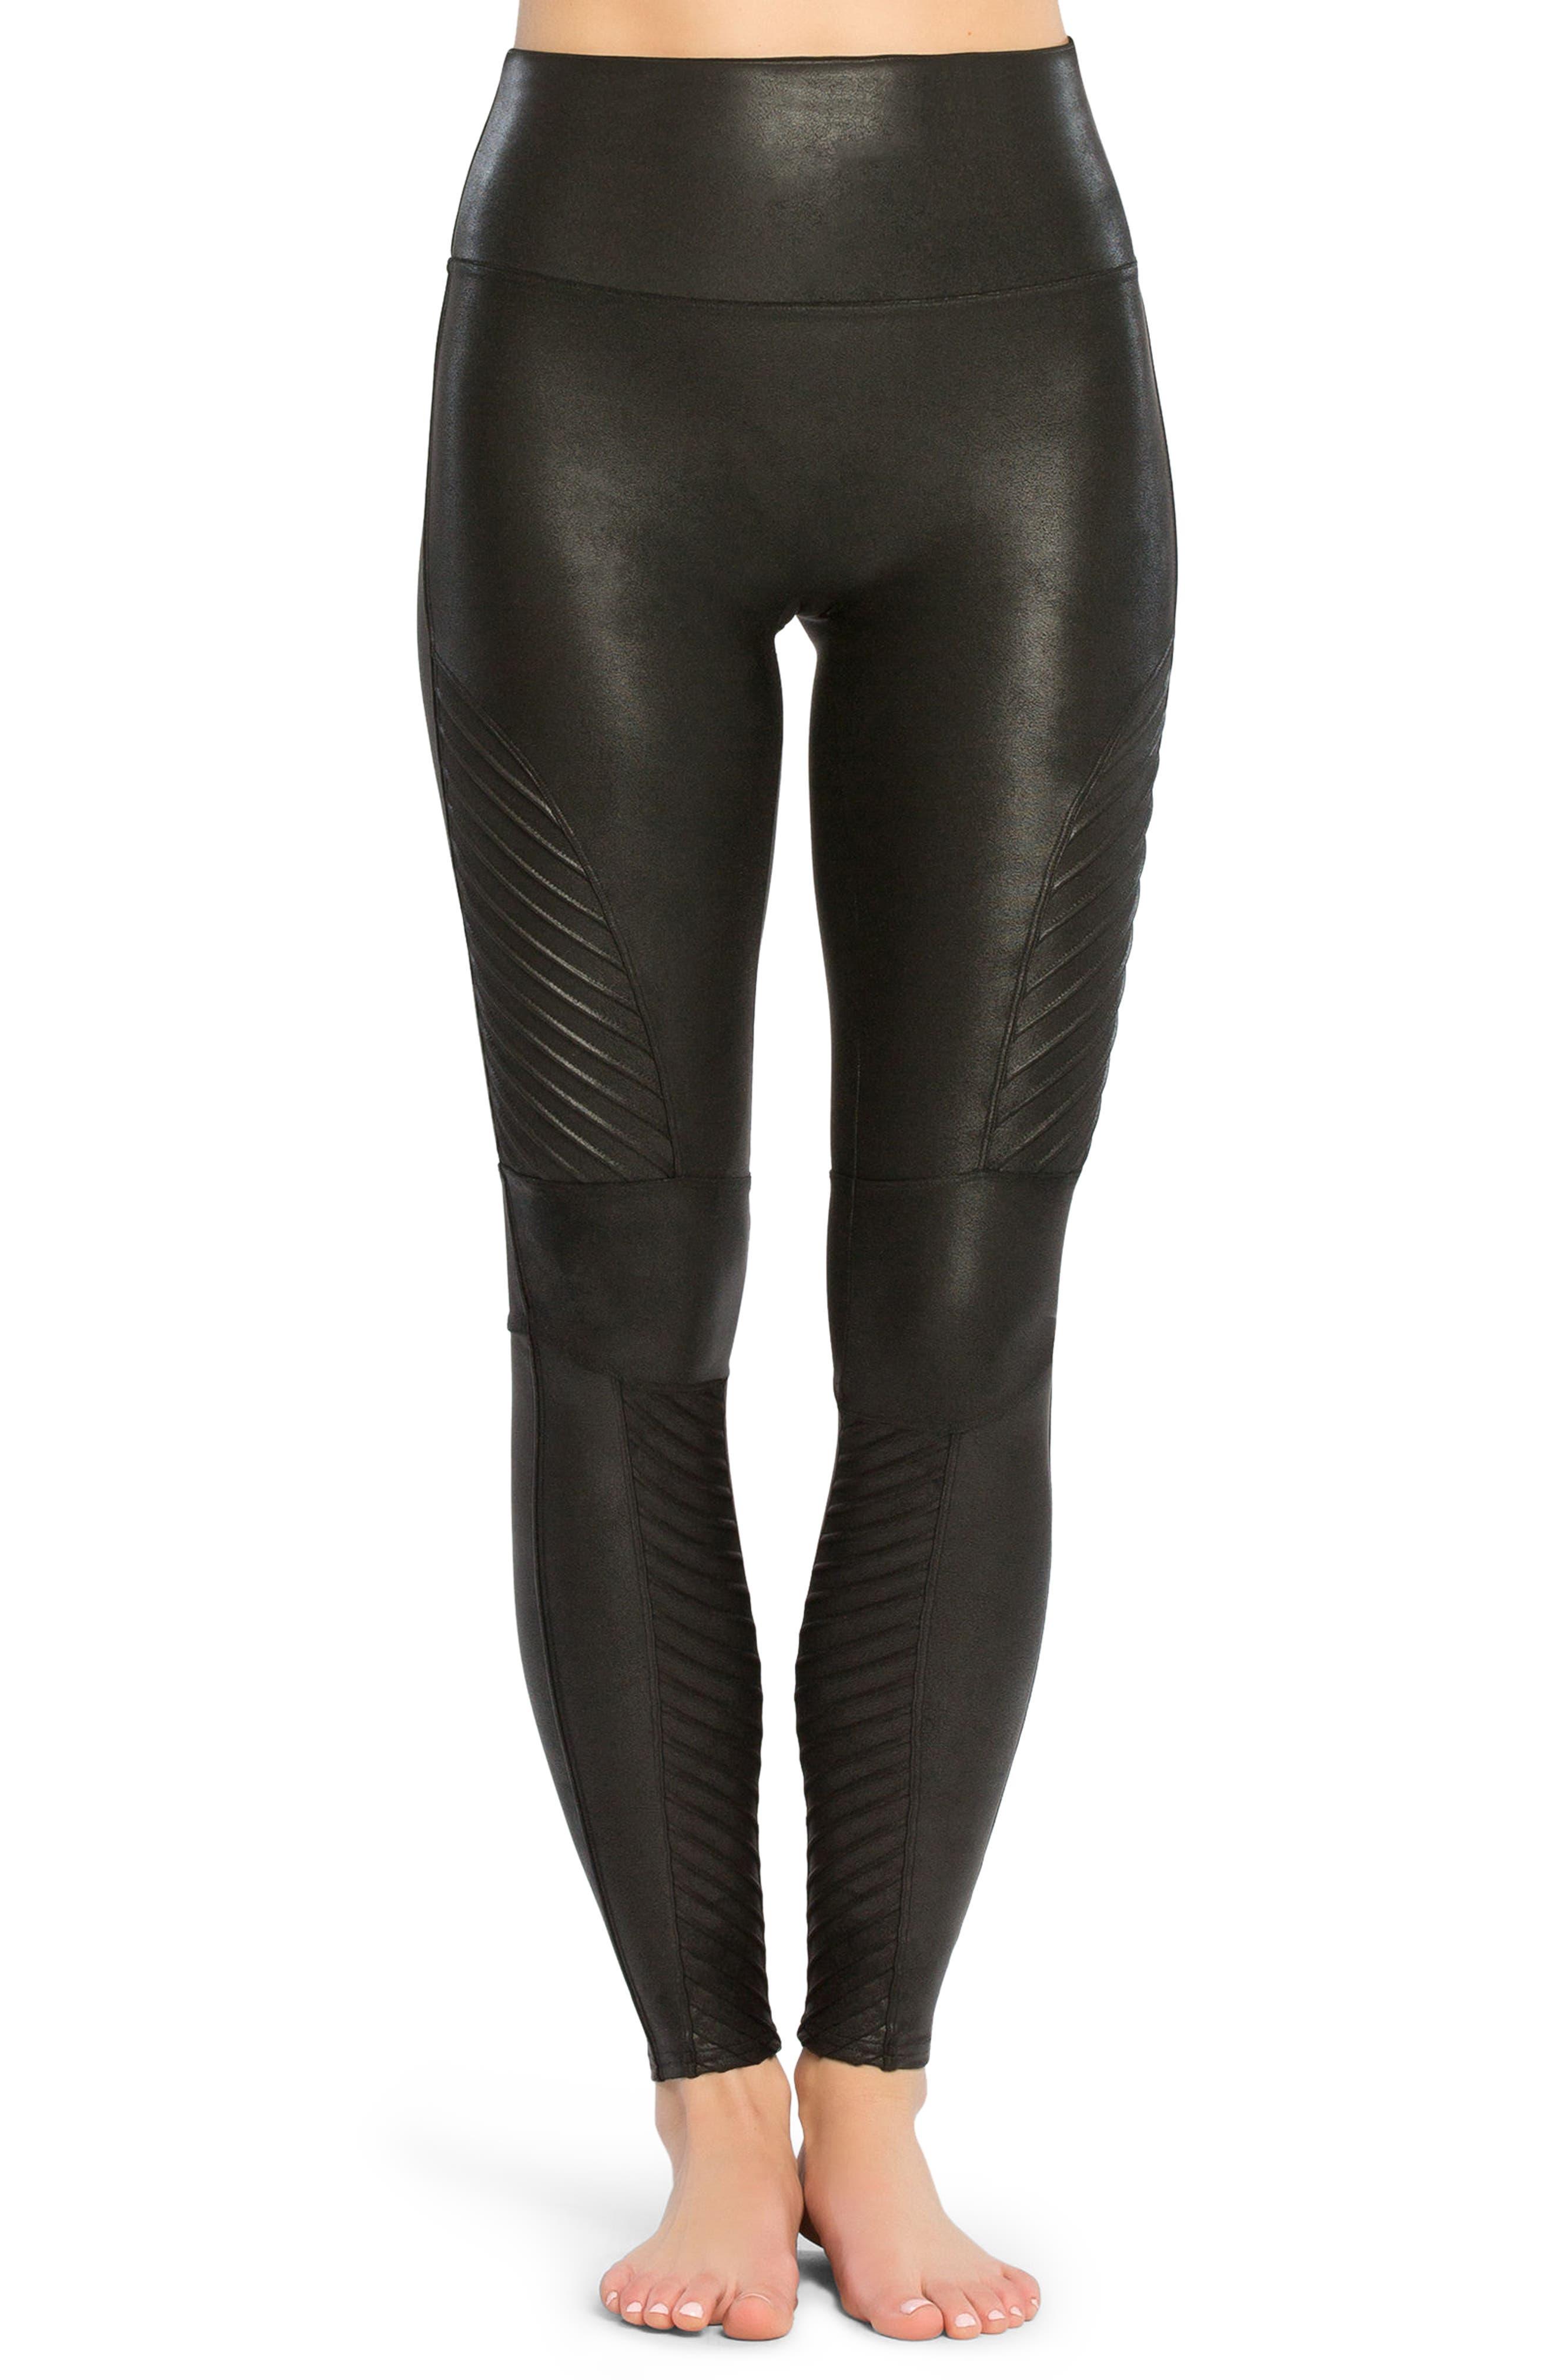 Leather look yoga leggings